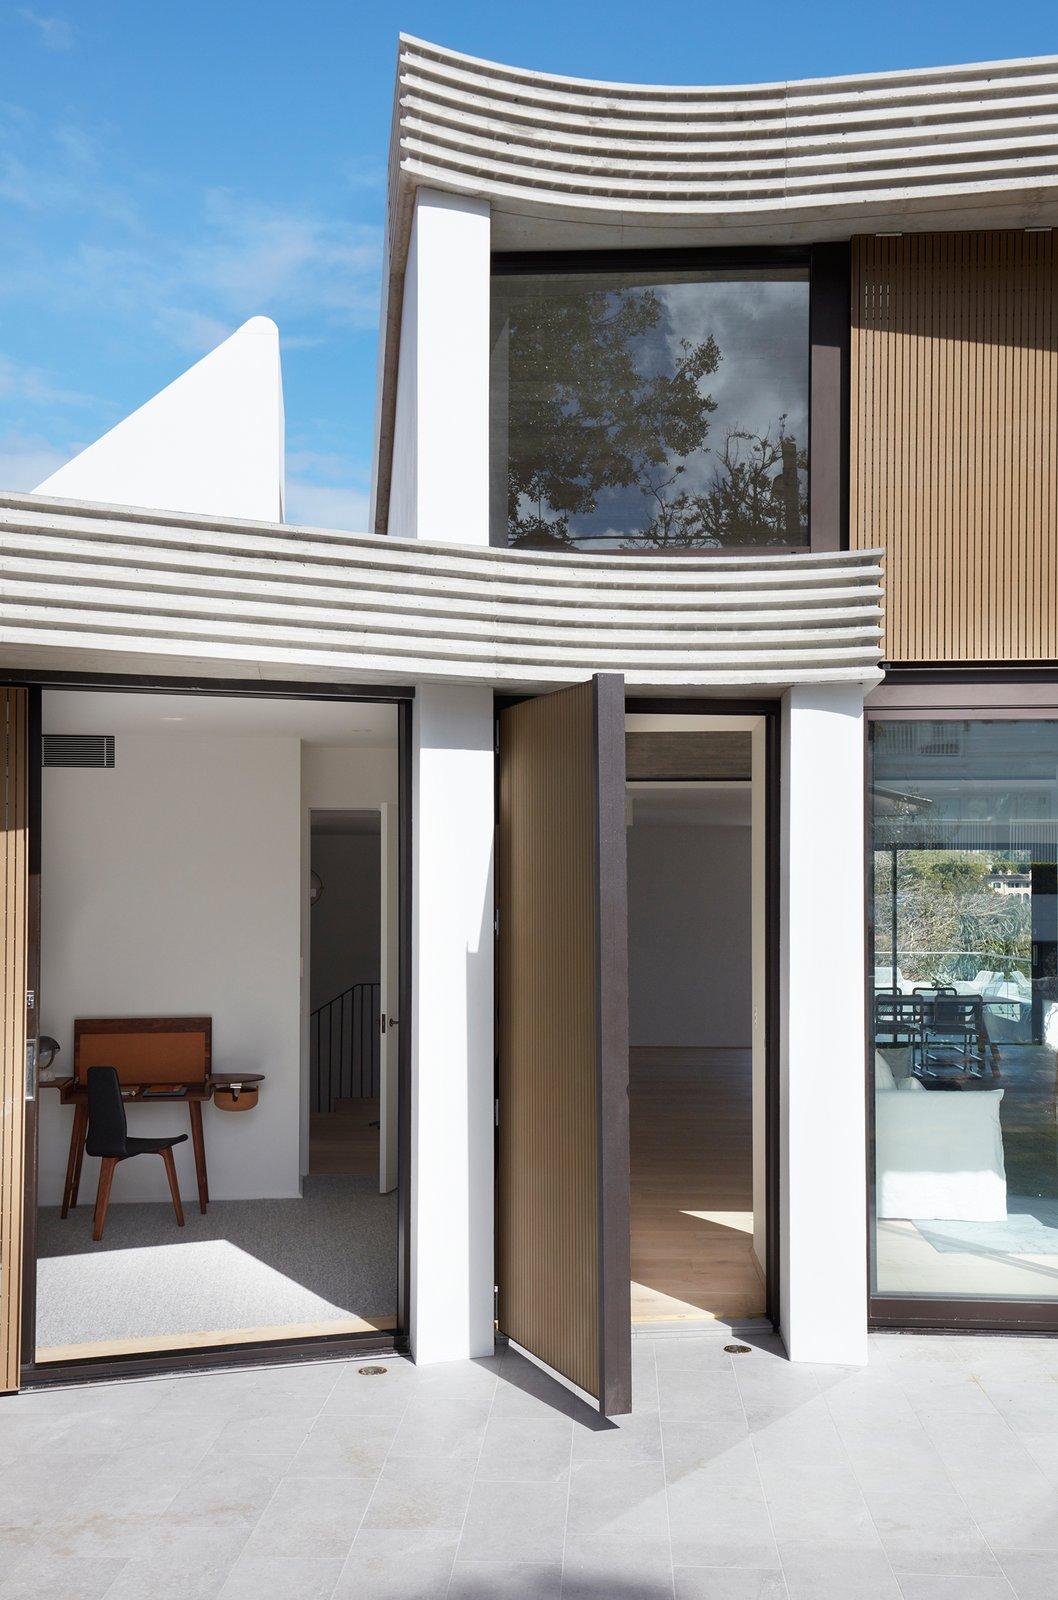 The Triplex Apartments by Luigi Rosselli Architects